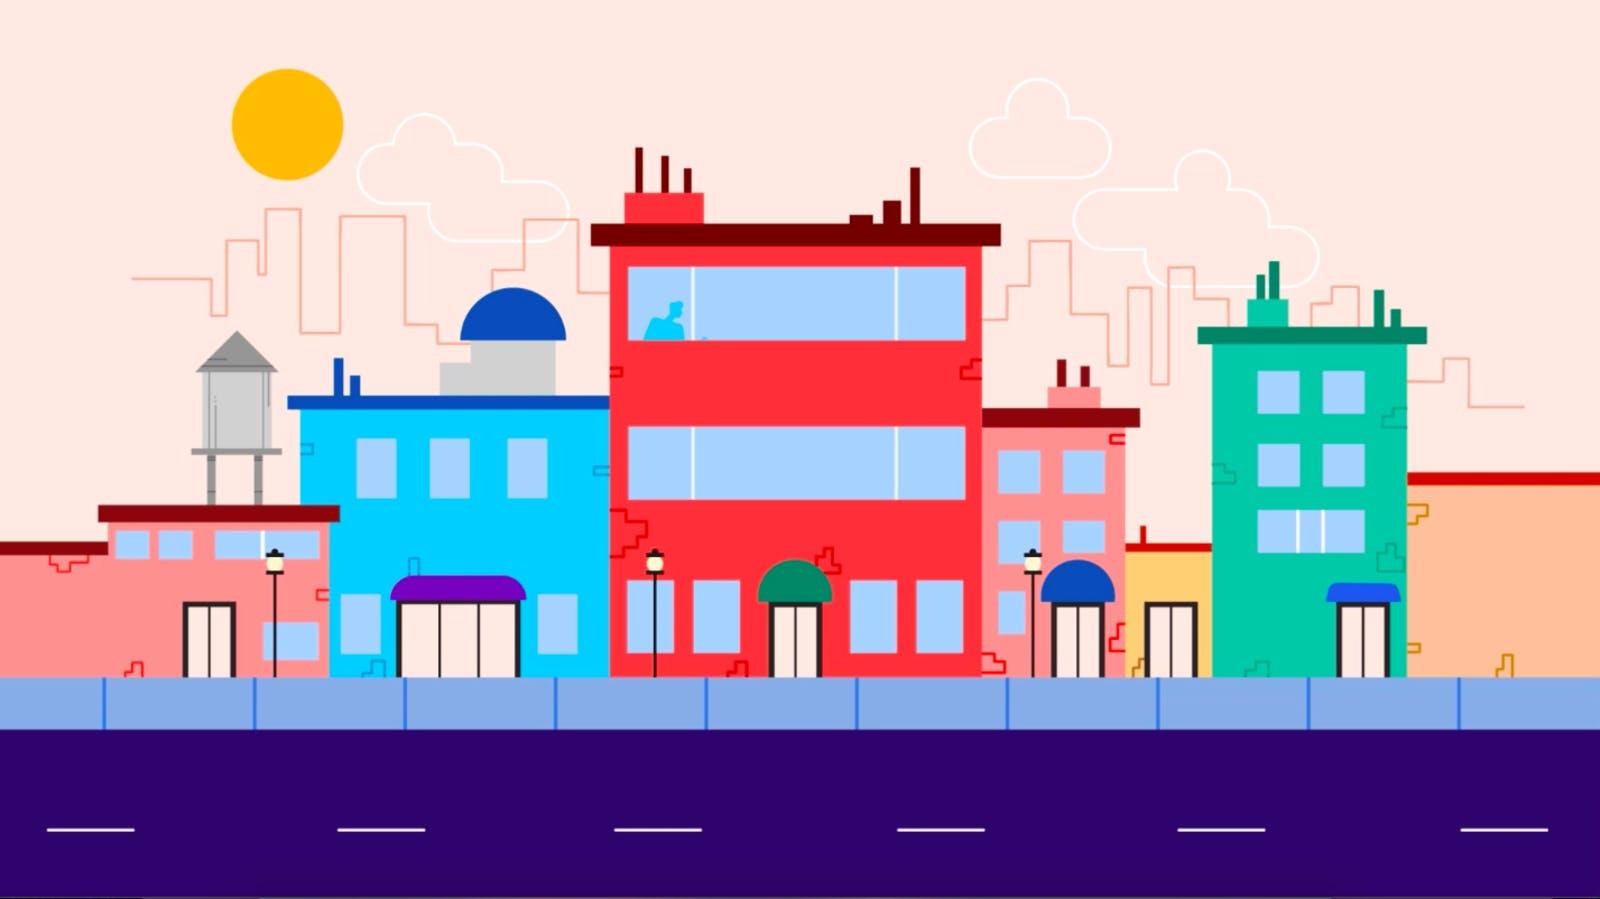 City Skyline Illustration of office buildings